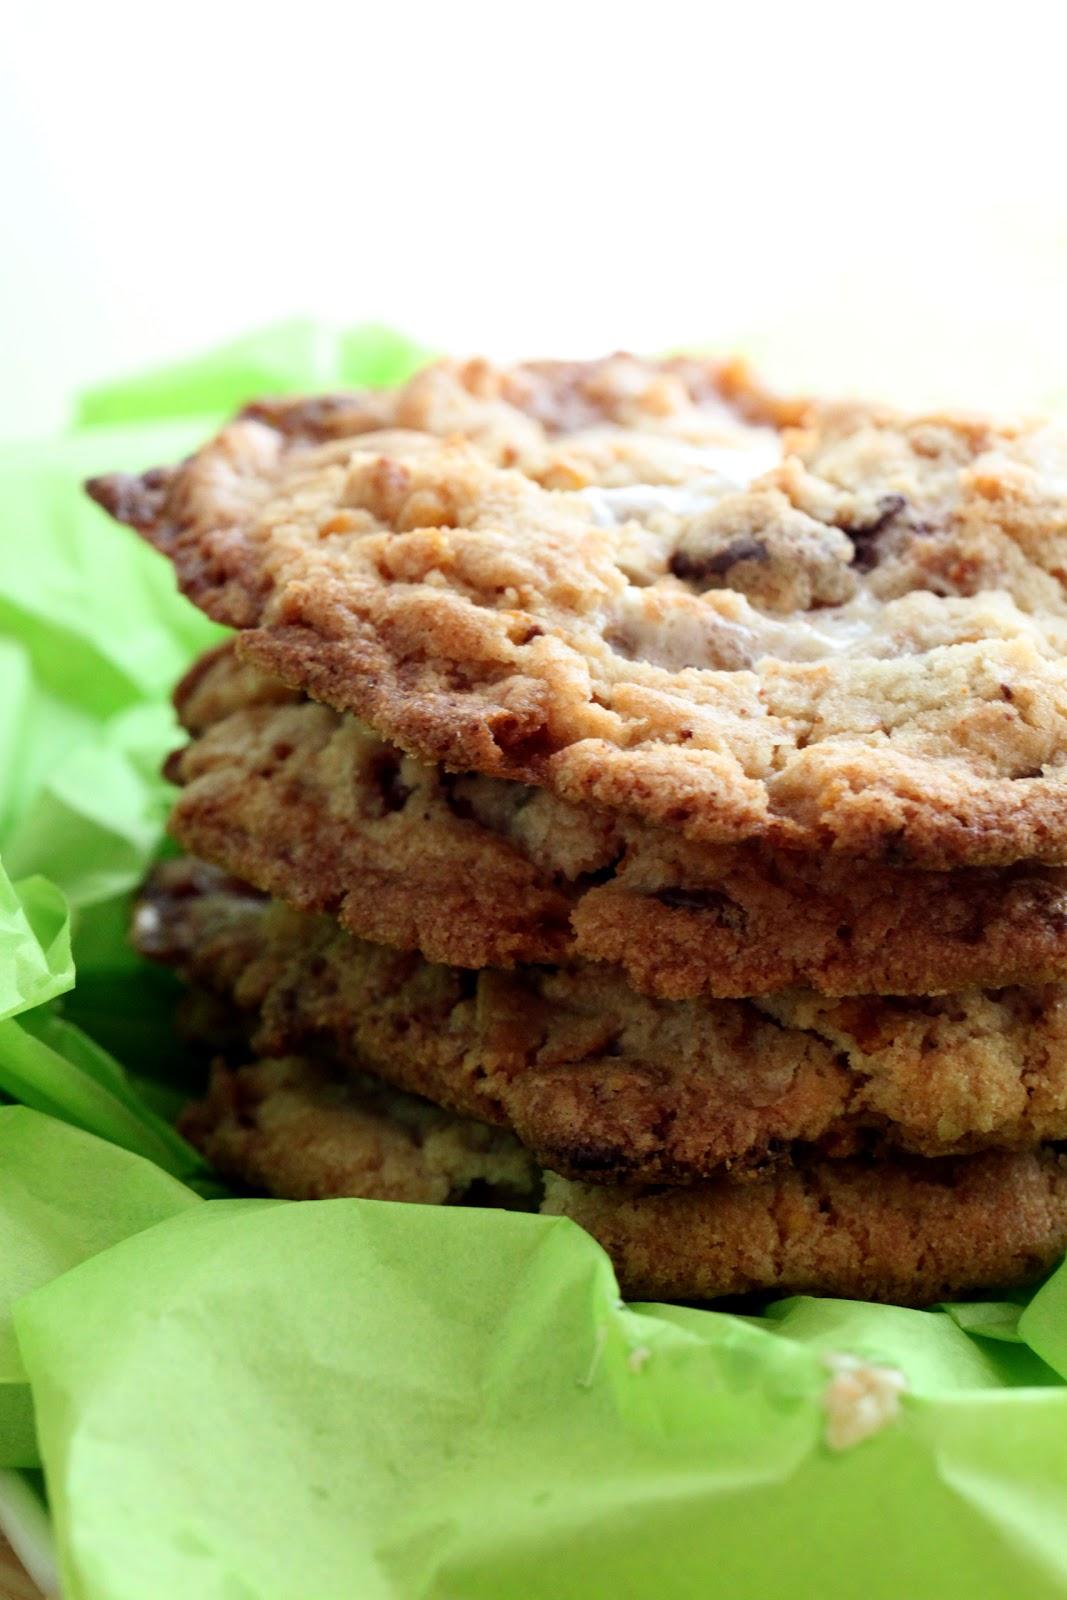 Badger Kitchen: Cornflake, Marshmallow, Chocolate Chip Cookies